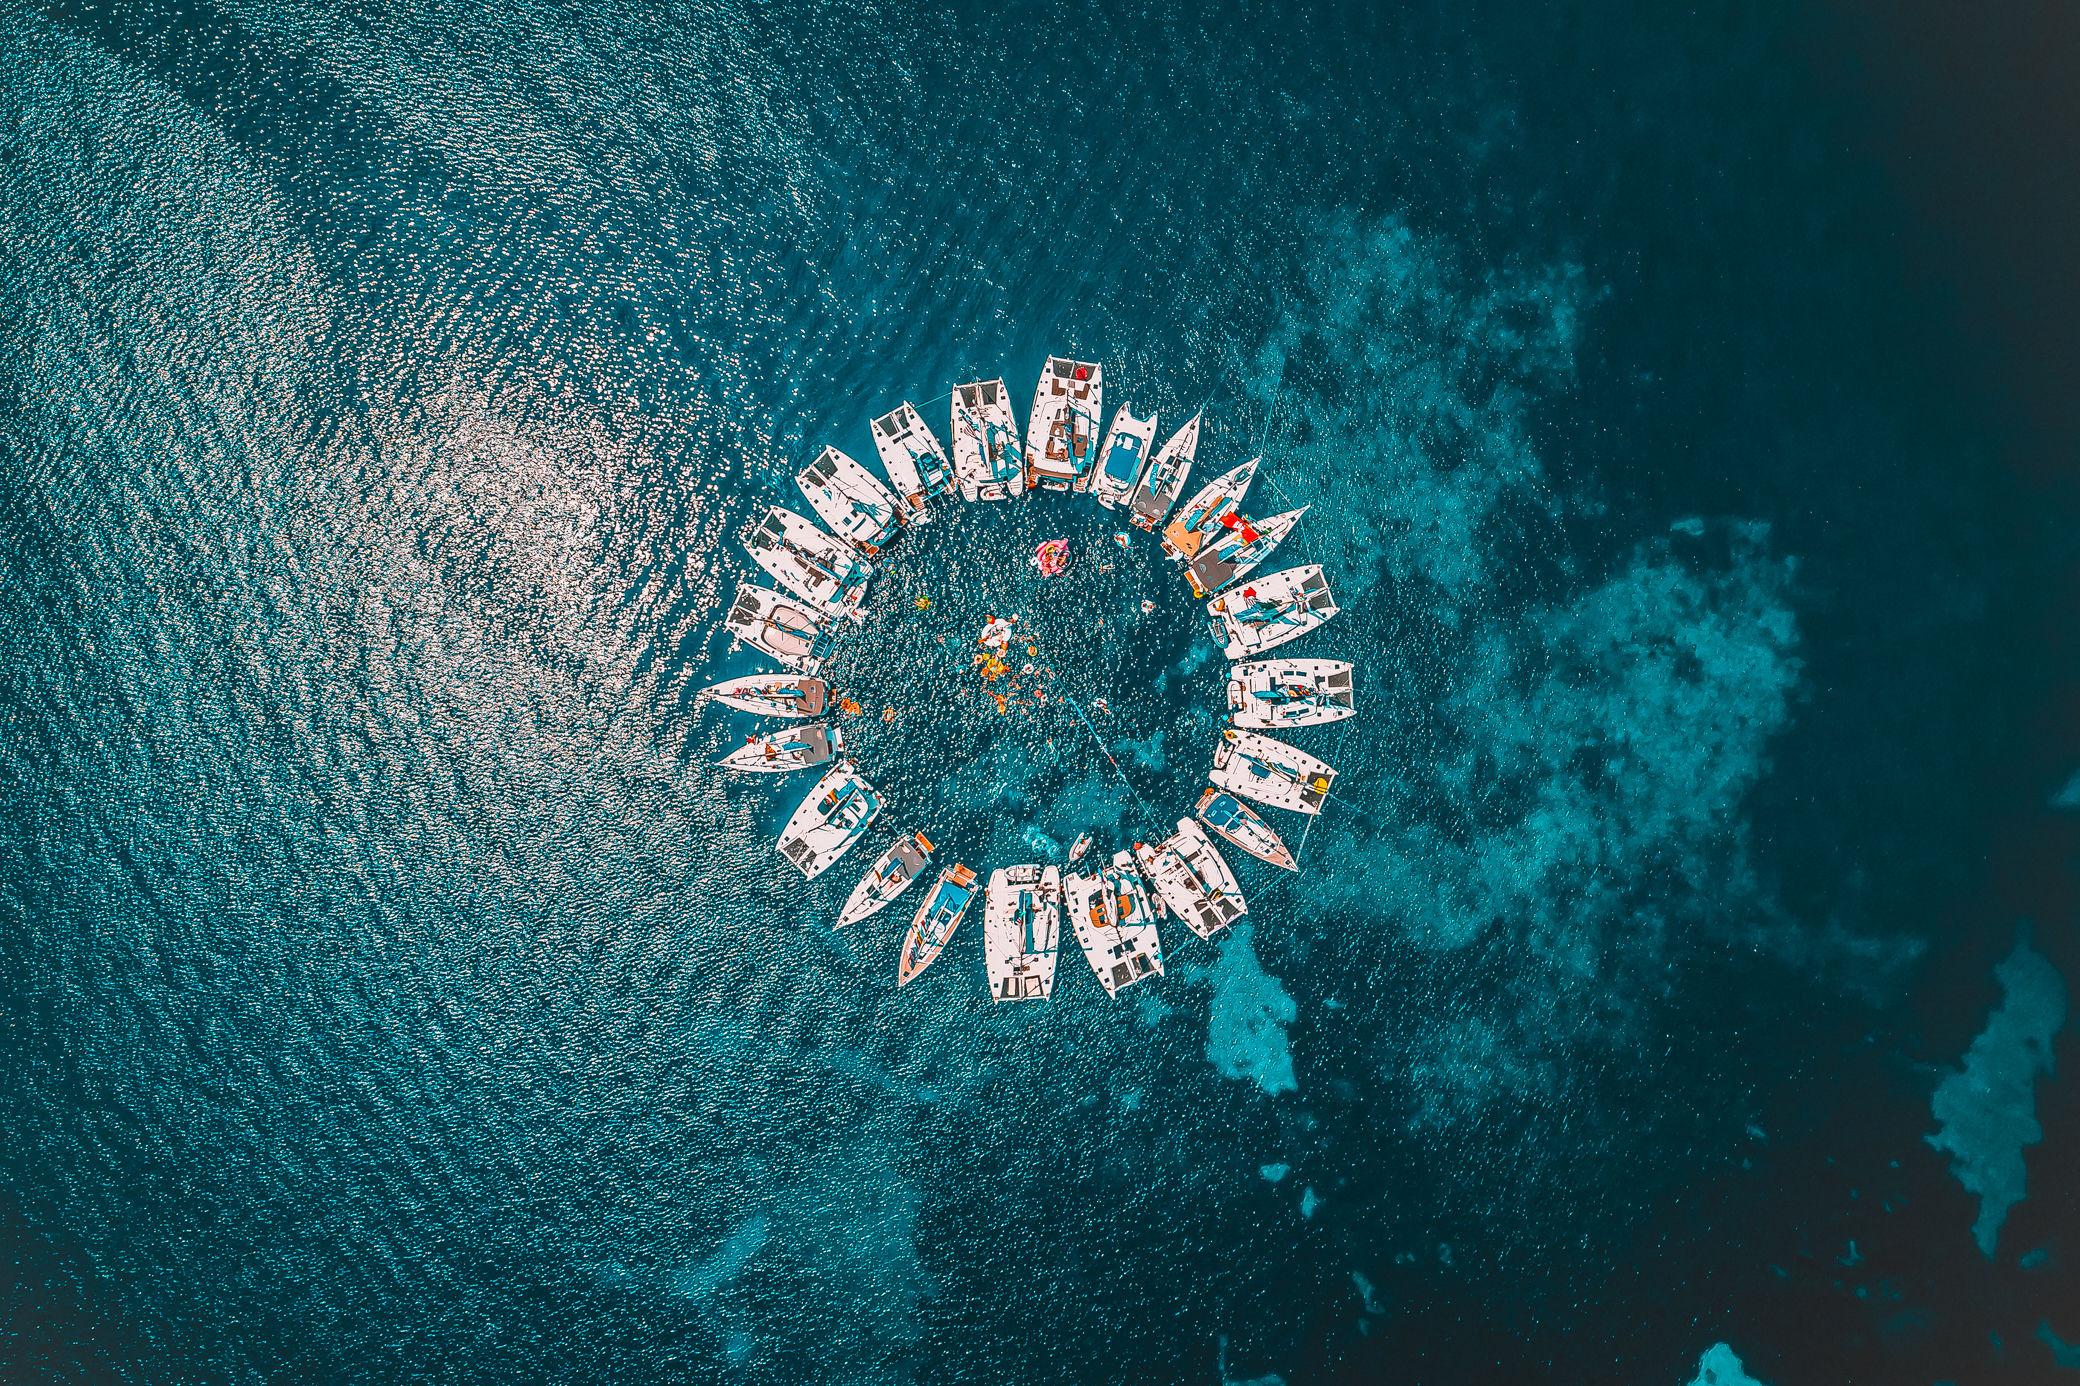 Yachts of The Bucketlust raft up in trademark formation on 'The Sardinia Route'. Photo Credit Roam Travel PR via The Bucketlust